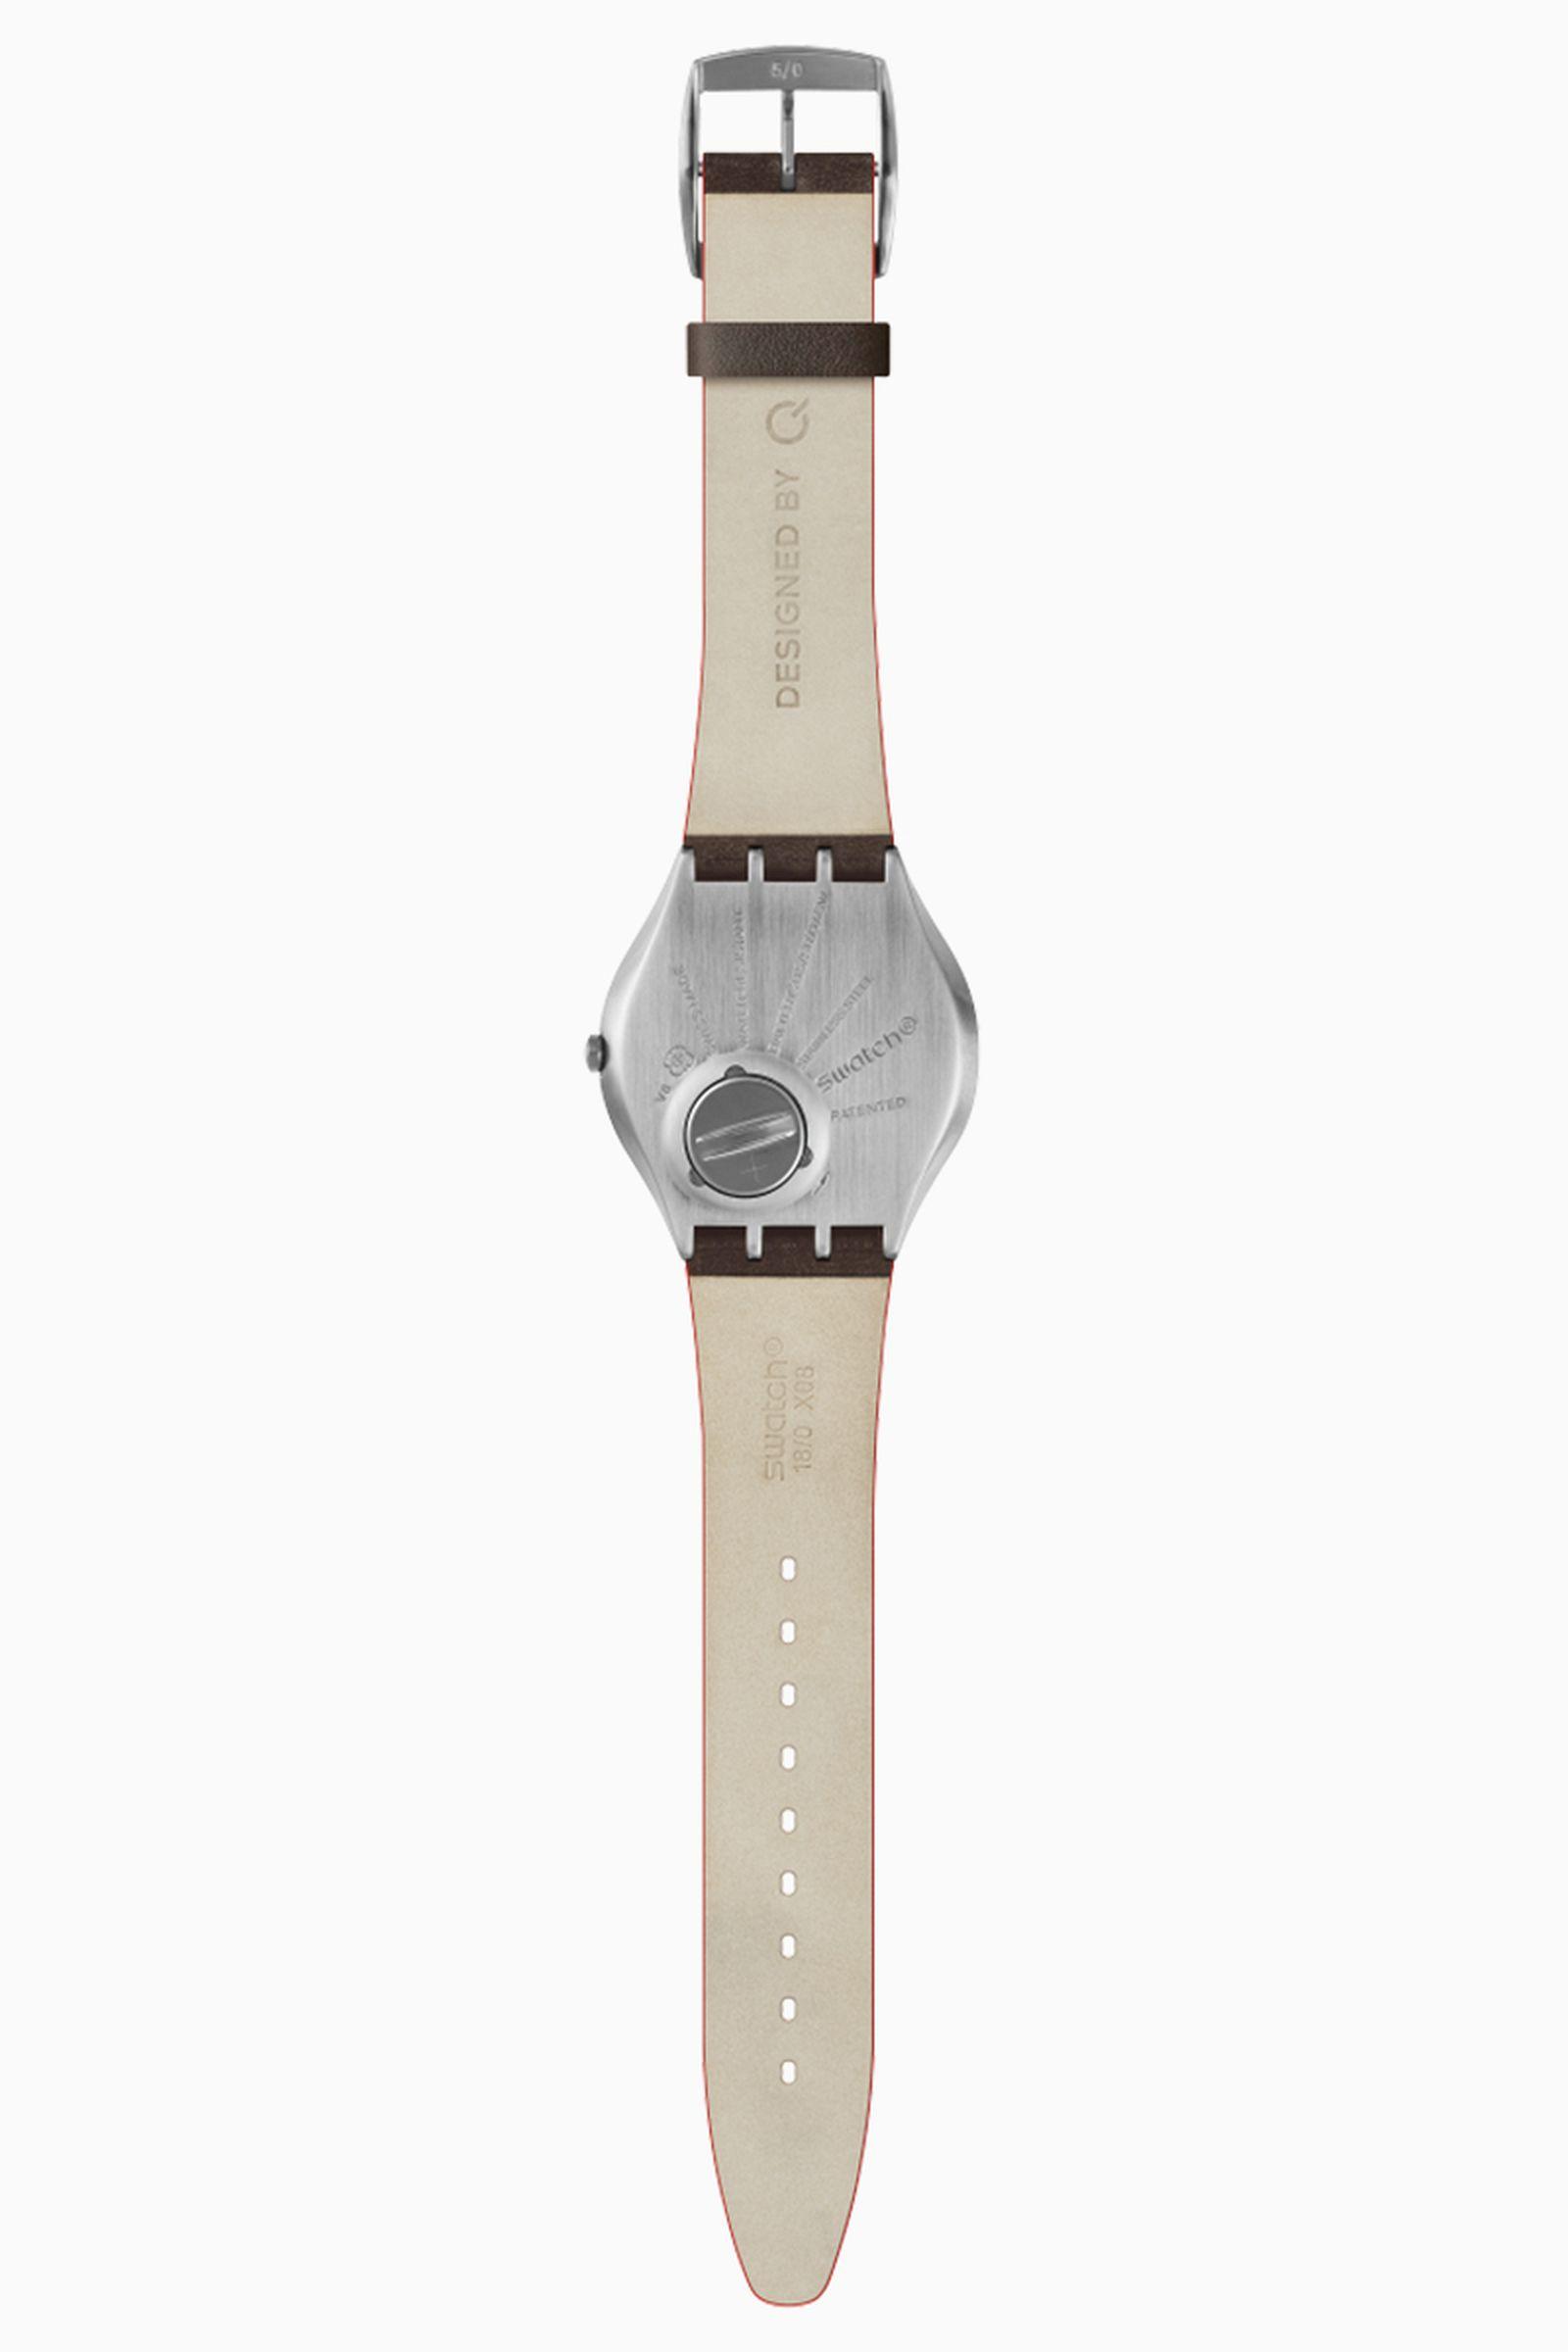 swatch-q-james-bond-no-time-to-die-3